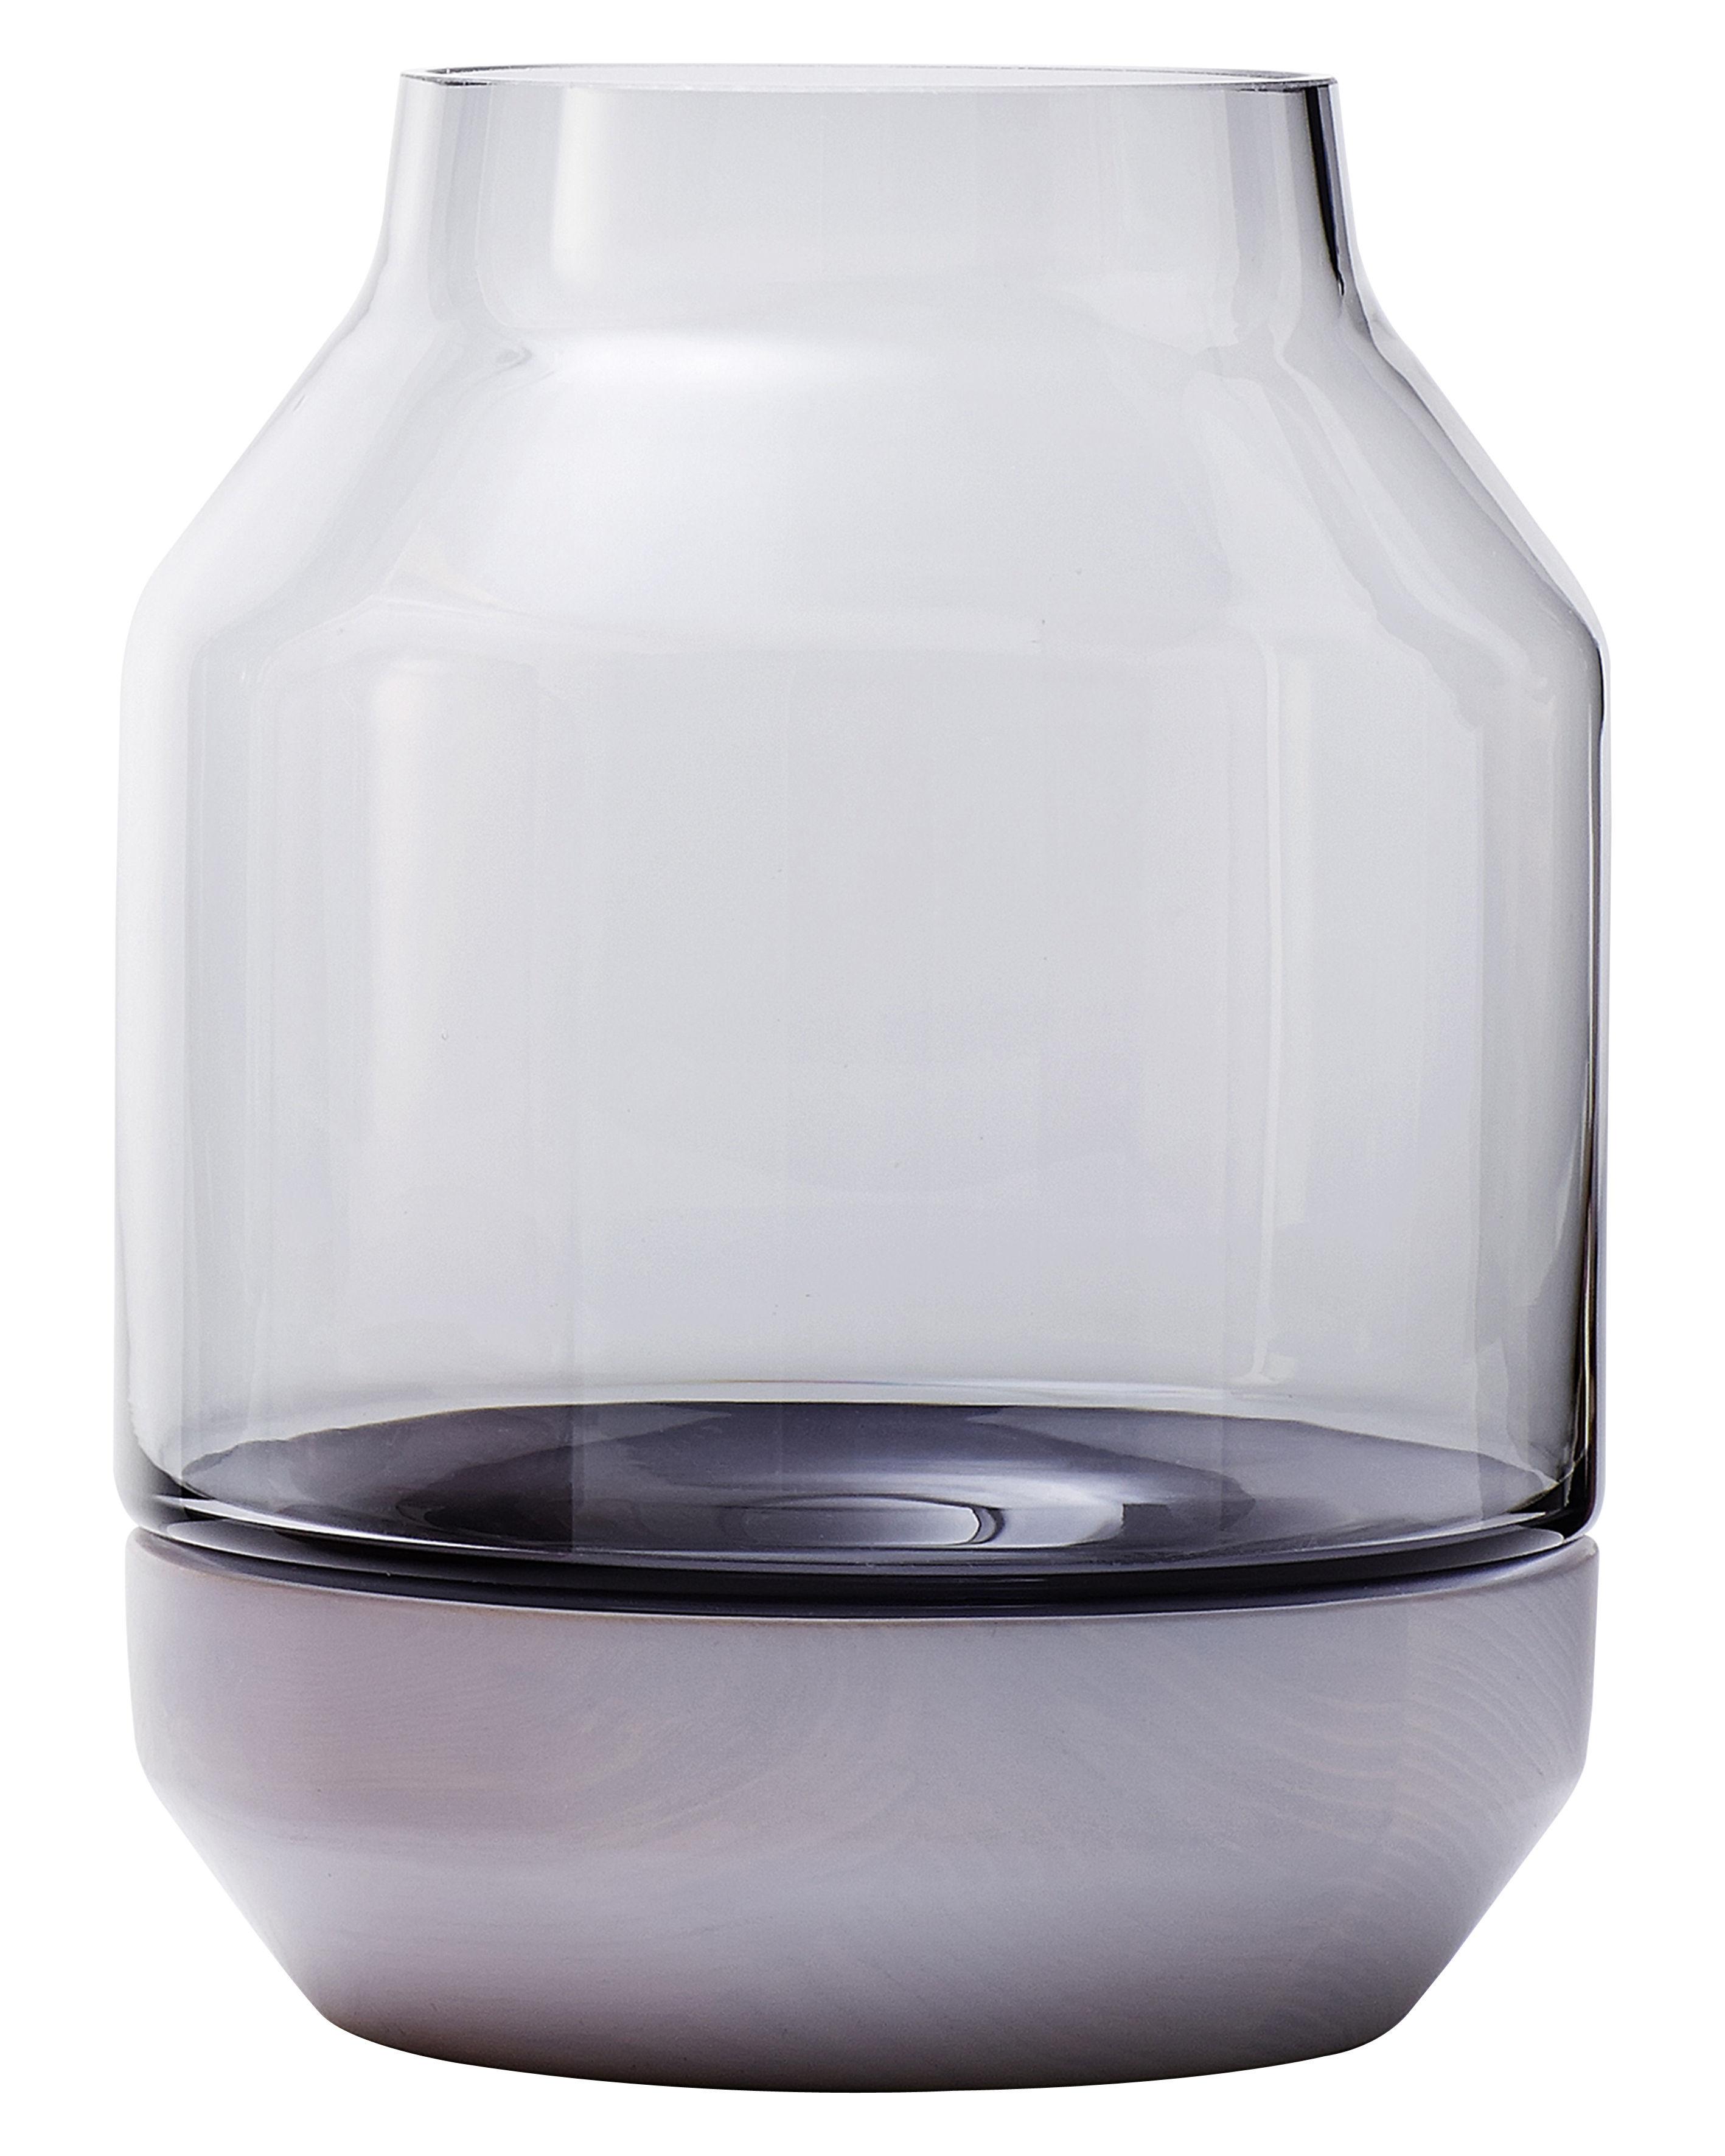 Interni - Vasi - Vaso Elevated di Muuto - Grigio - Frassino tinto, vetro soffiato